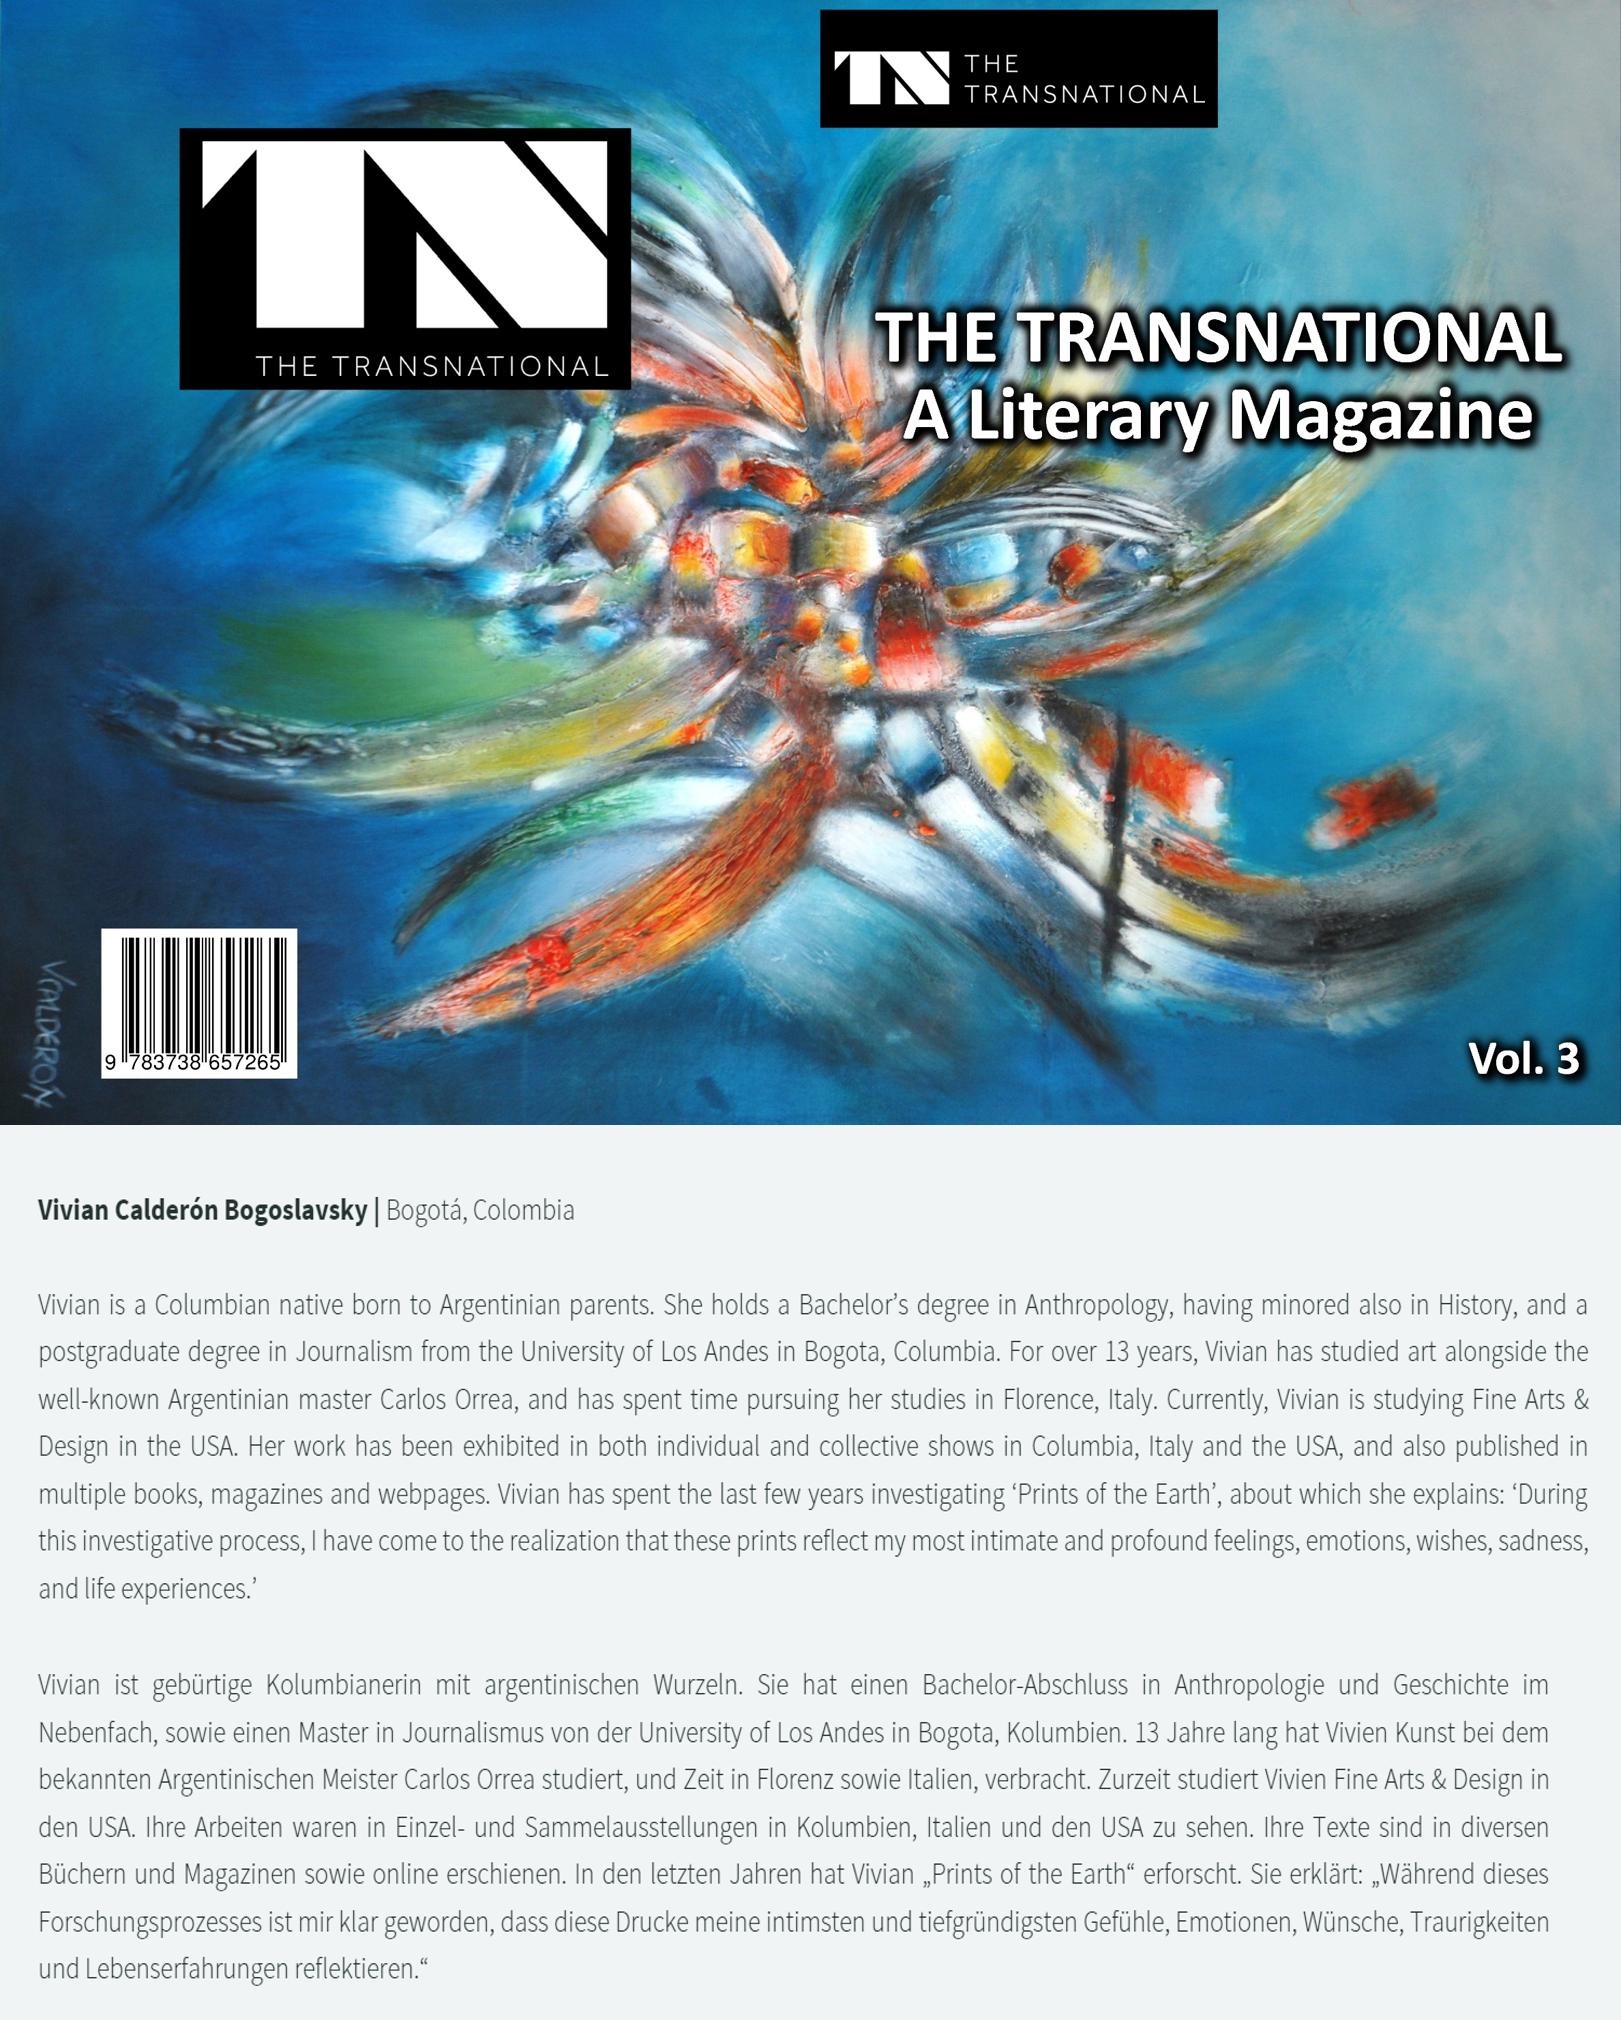 The Transnational A Literary Magazine Vol 3